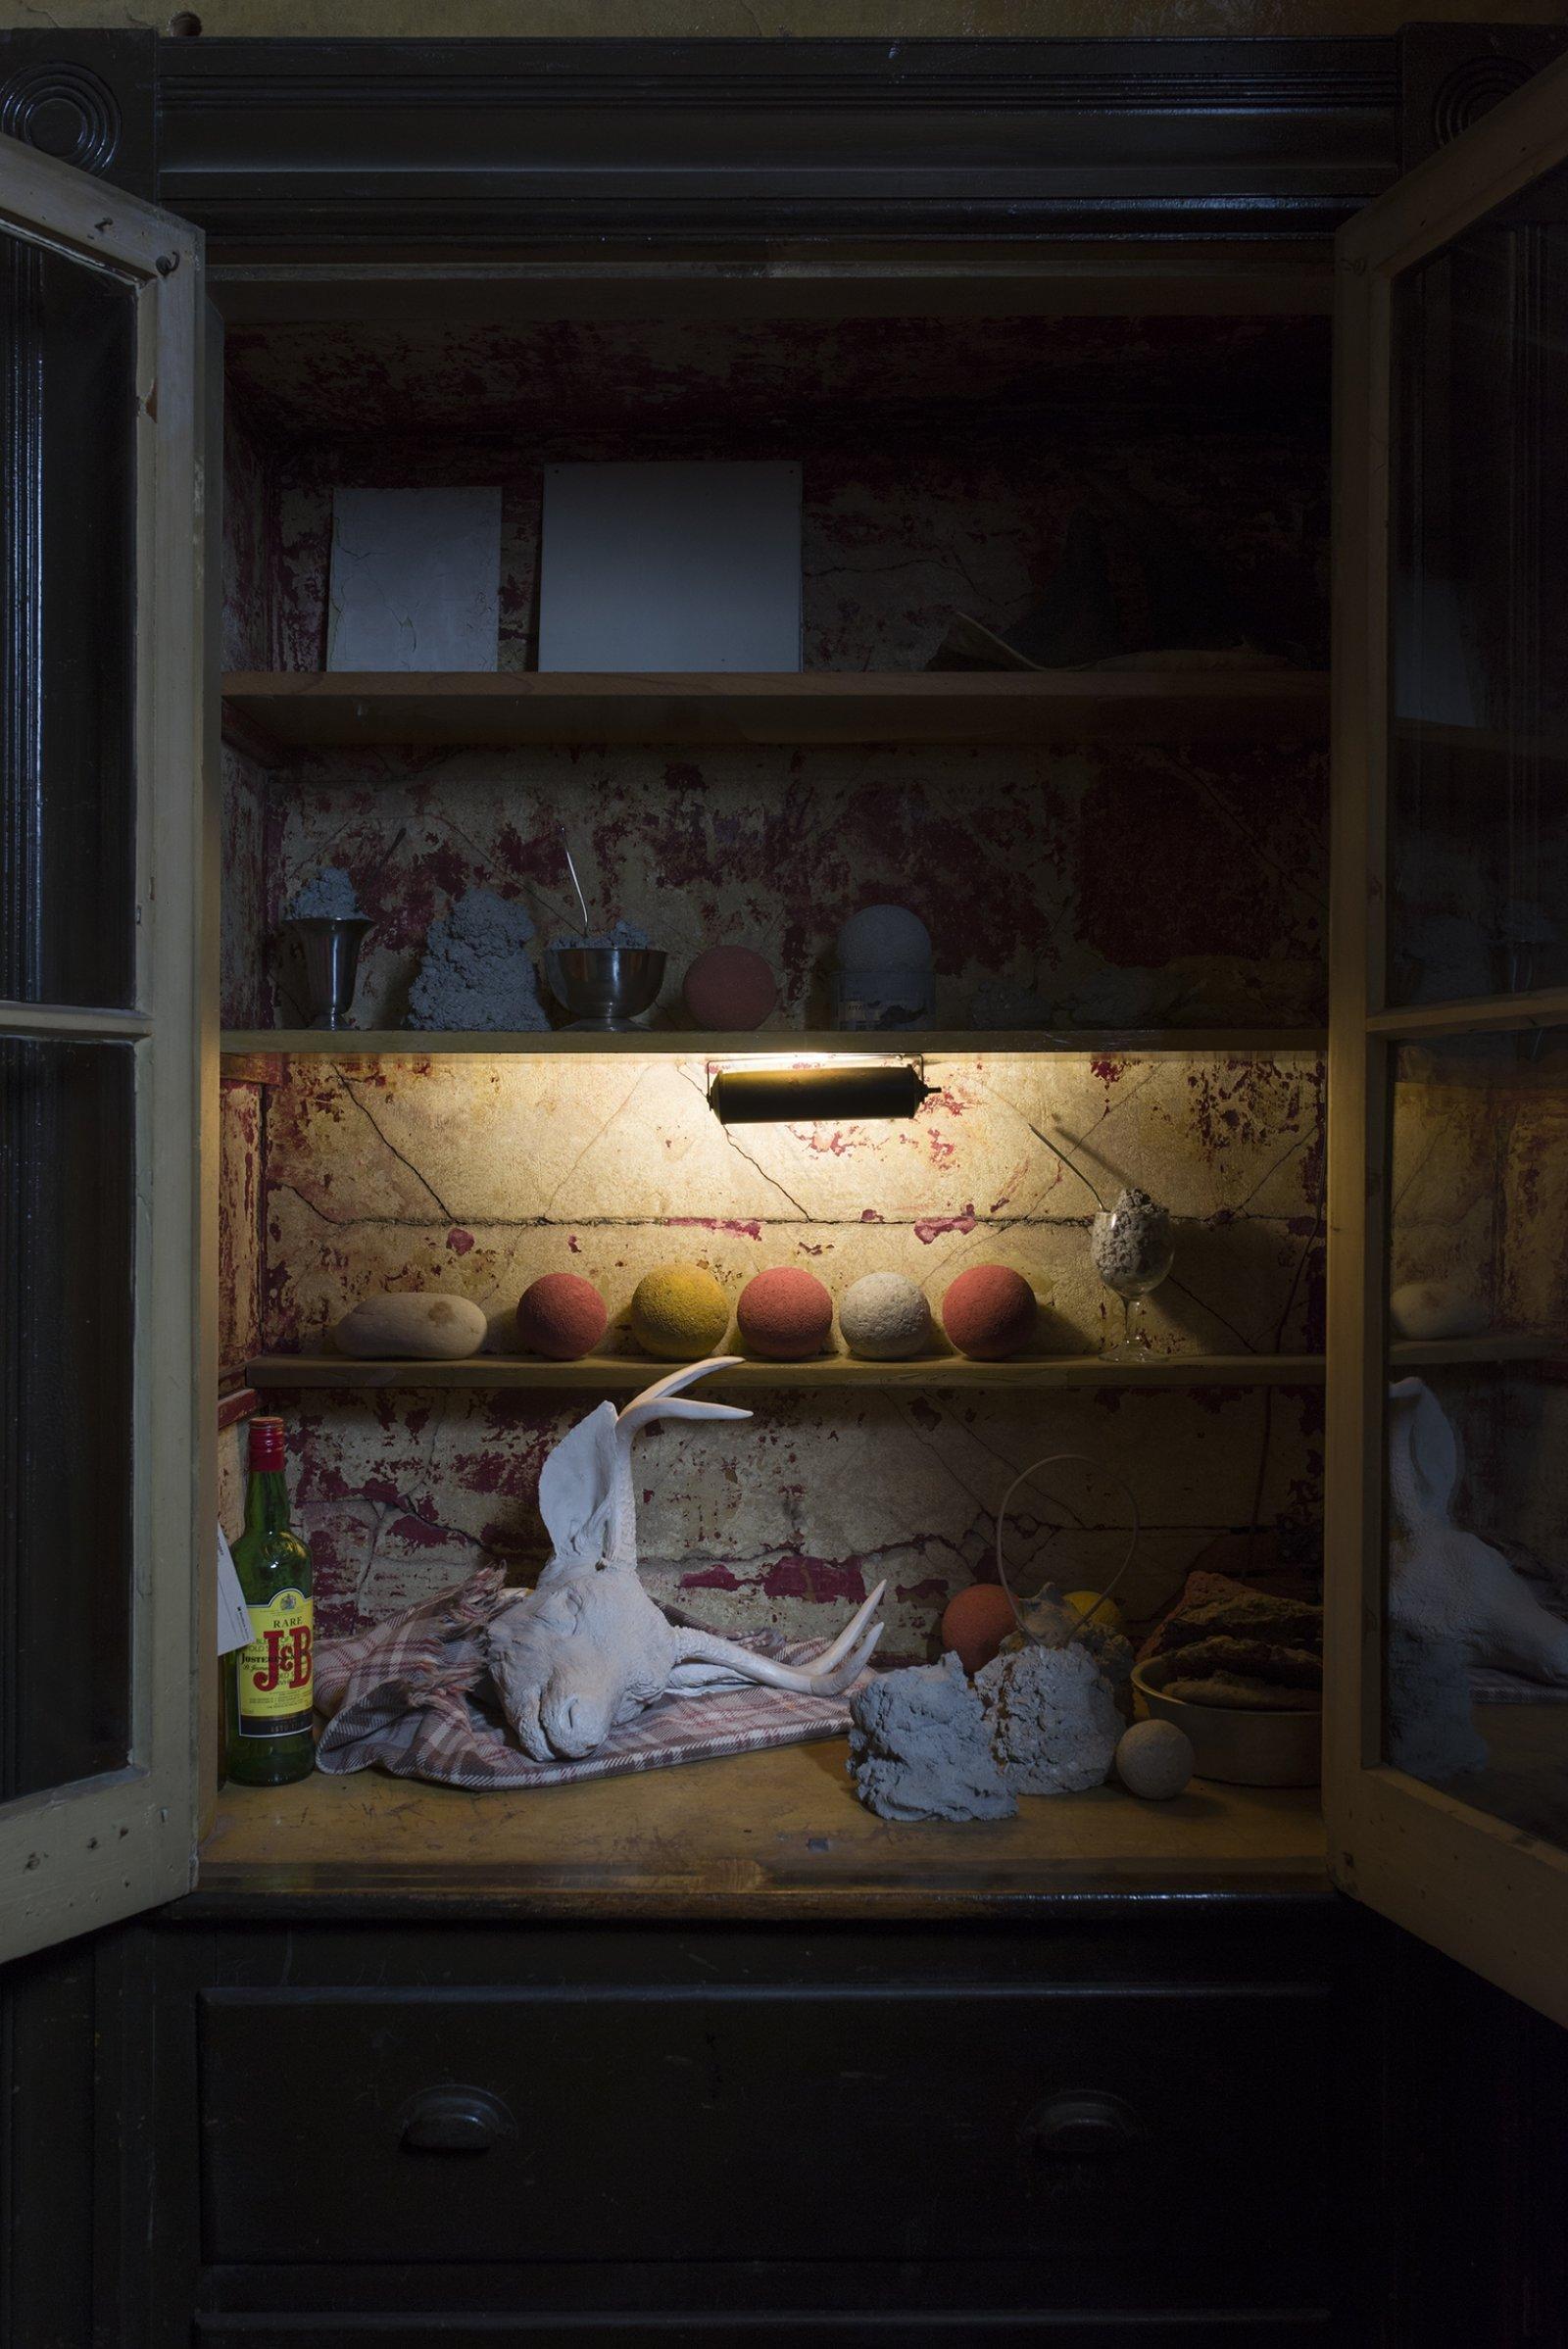 Liz Magor, Buck, 2008, polymerized gypsum, cotton, 16 x 30 x 26 in. (41 x 76 x 61 cm). Installation view, TIMESHARE, The David Ireland House, 500 Capp Street Foundation, San Francisco, USA, 2019 by Liz Magor